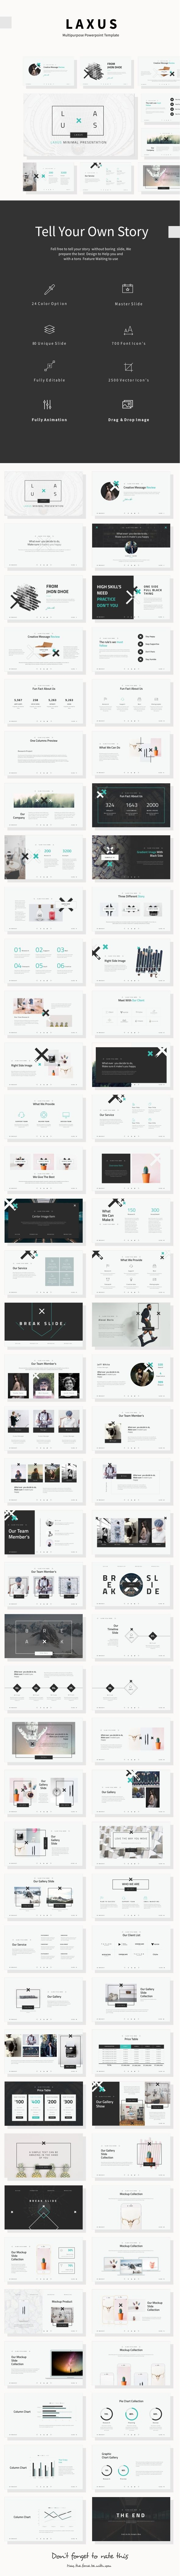 Laxus Multipurpose Theme — Powerpoint PPTX #chart #theme • Download ➝ https://graphicriver.net/item/laxus-multipurpose-theme/19244172?ref=pxcr